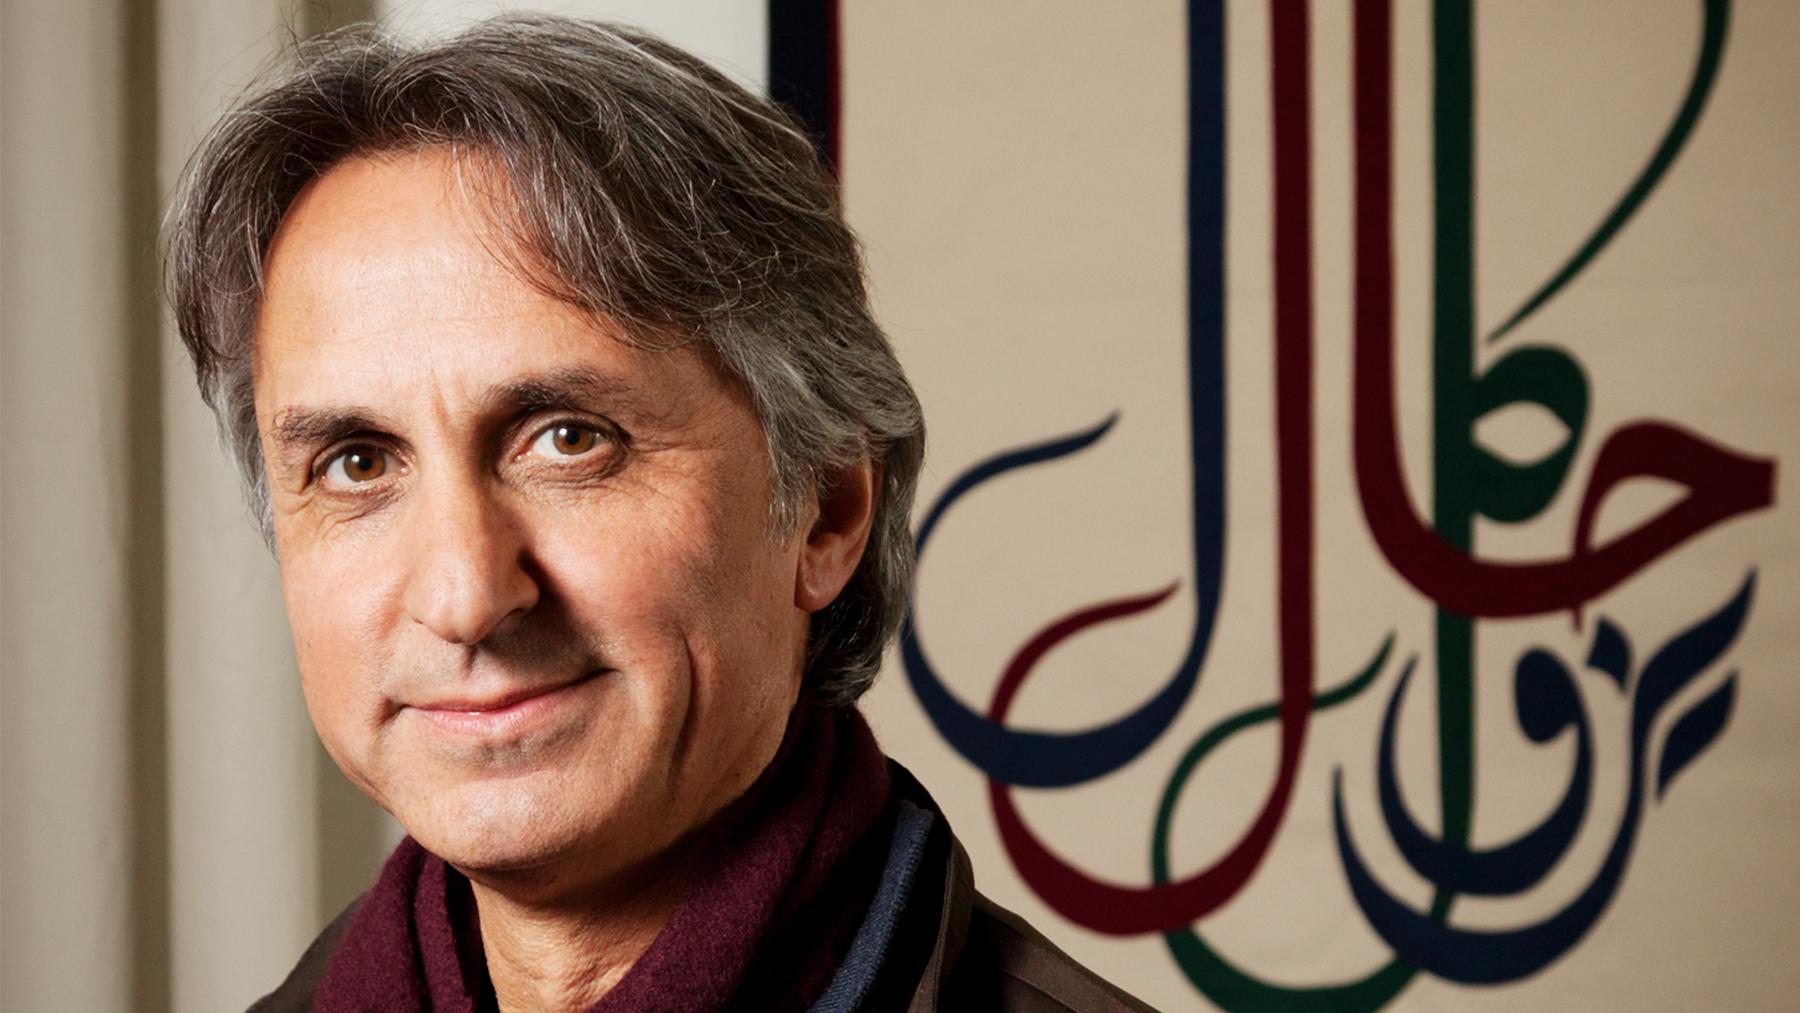 Professor Asef Bayat. Photo by L. B. Stauffer